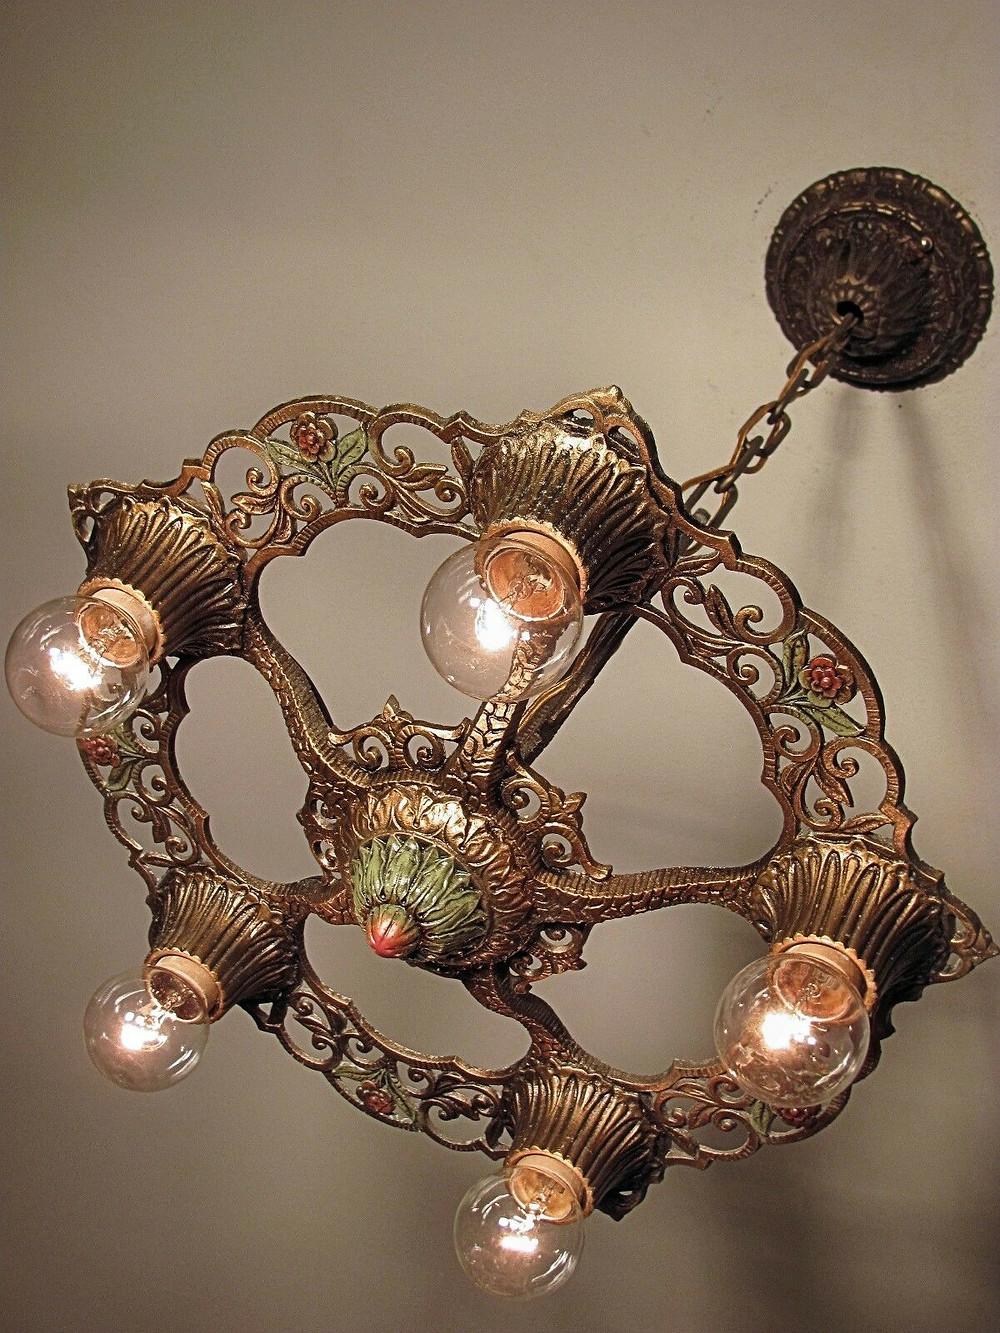 Virden Winthrop 5 light chandelier adds character to a Denver Square